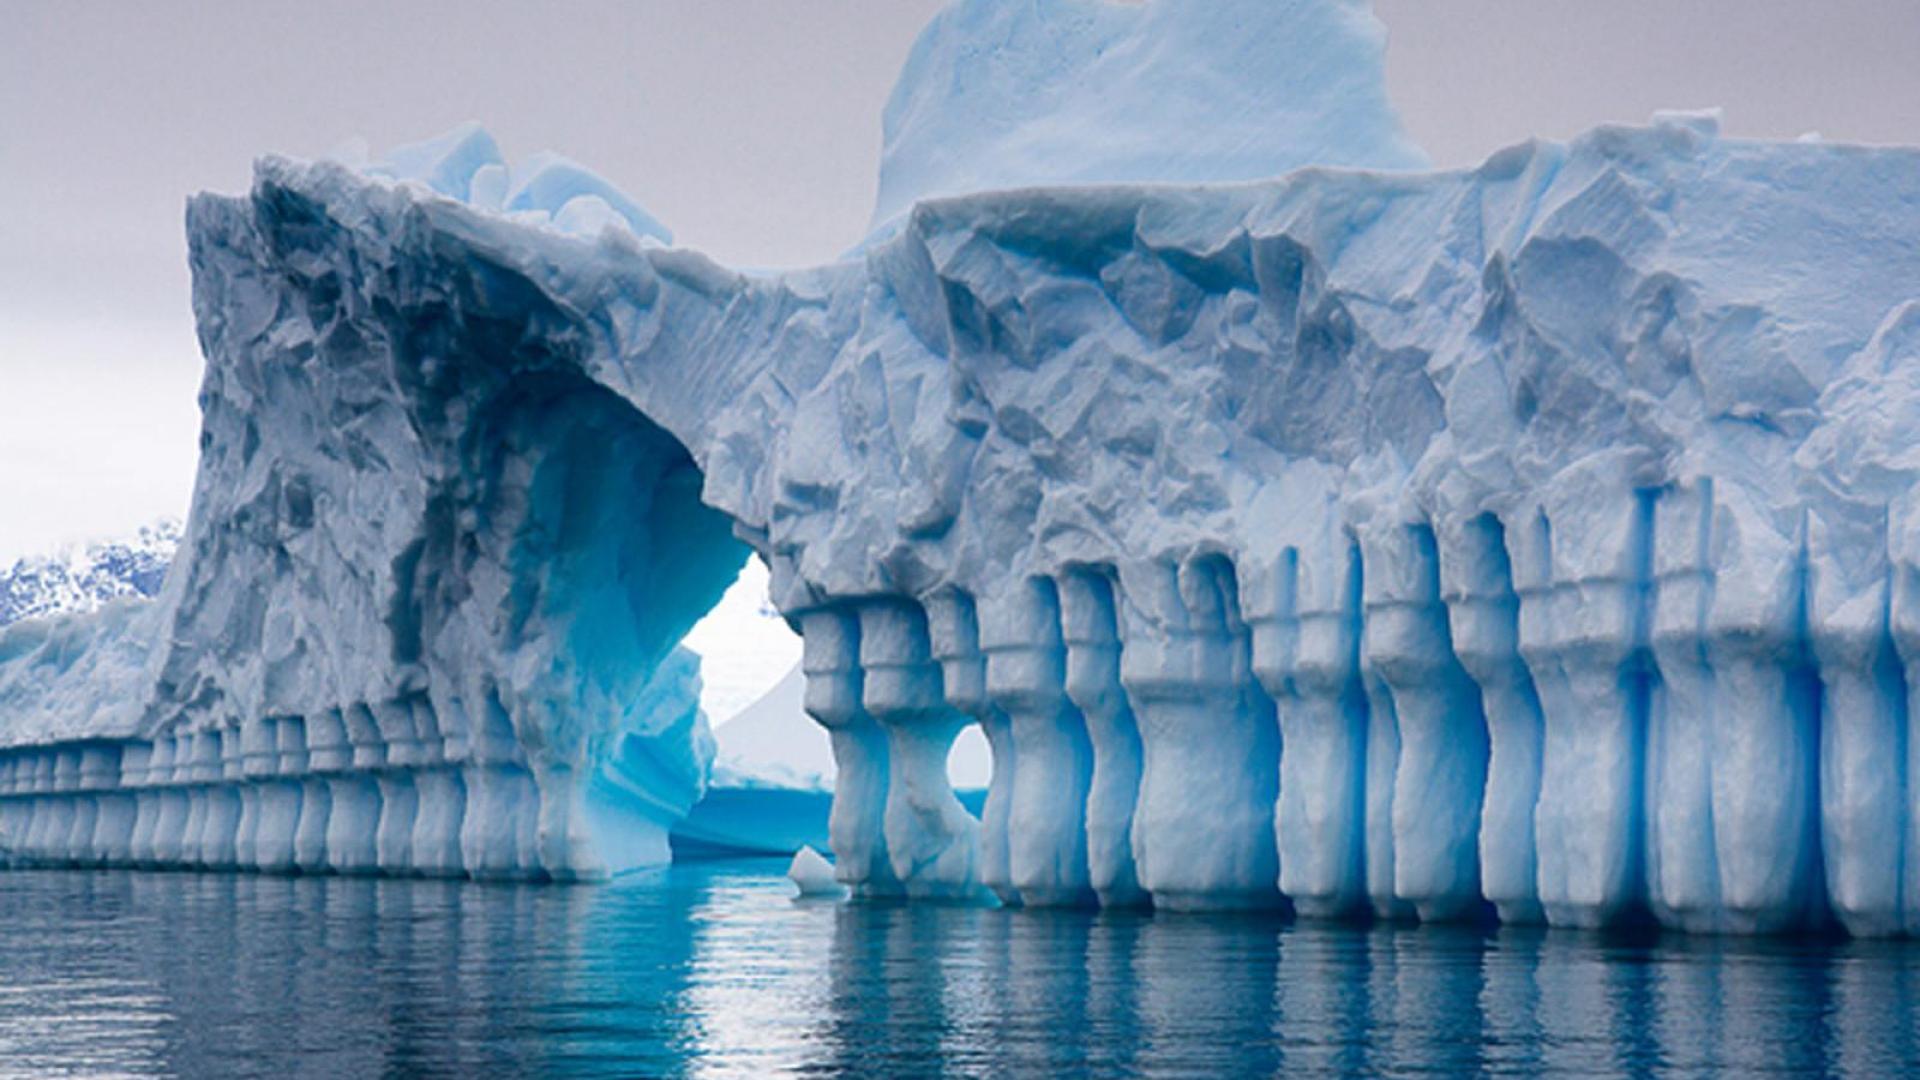 Antarctica Wallpapers Widescreen   Iceberg Pleneau Bay 973475 1920x1080